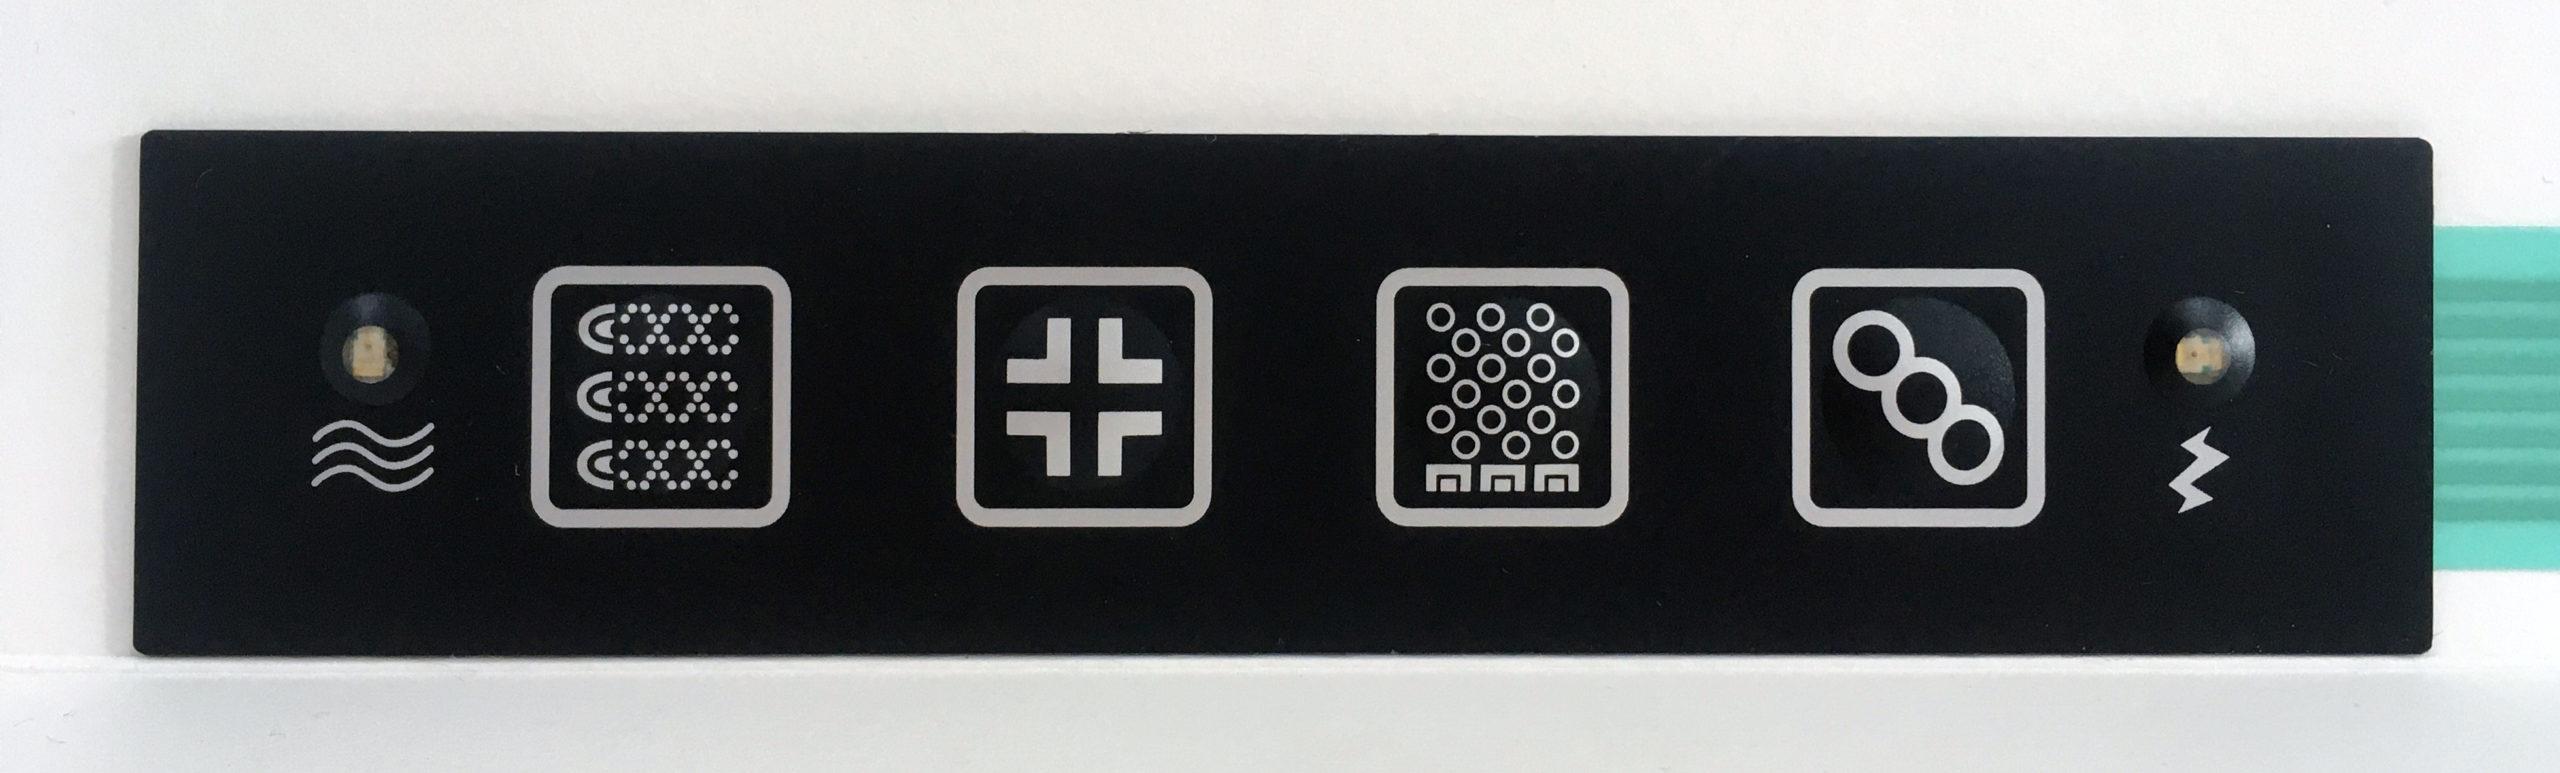 Kit whirlpool, blower, cromoterapia, clean con tastiera 'Flat'